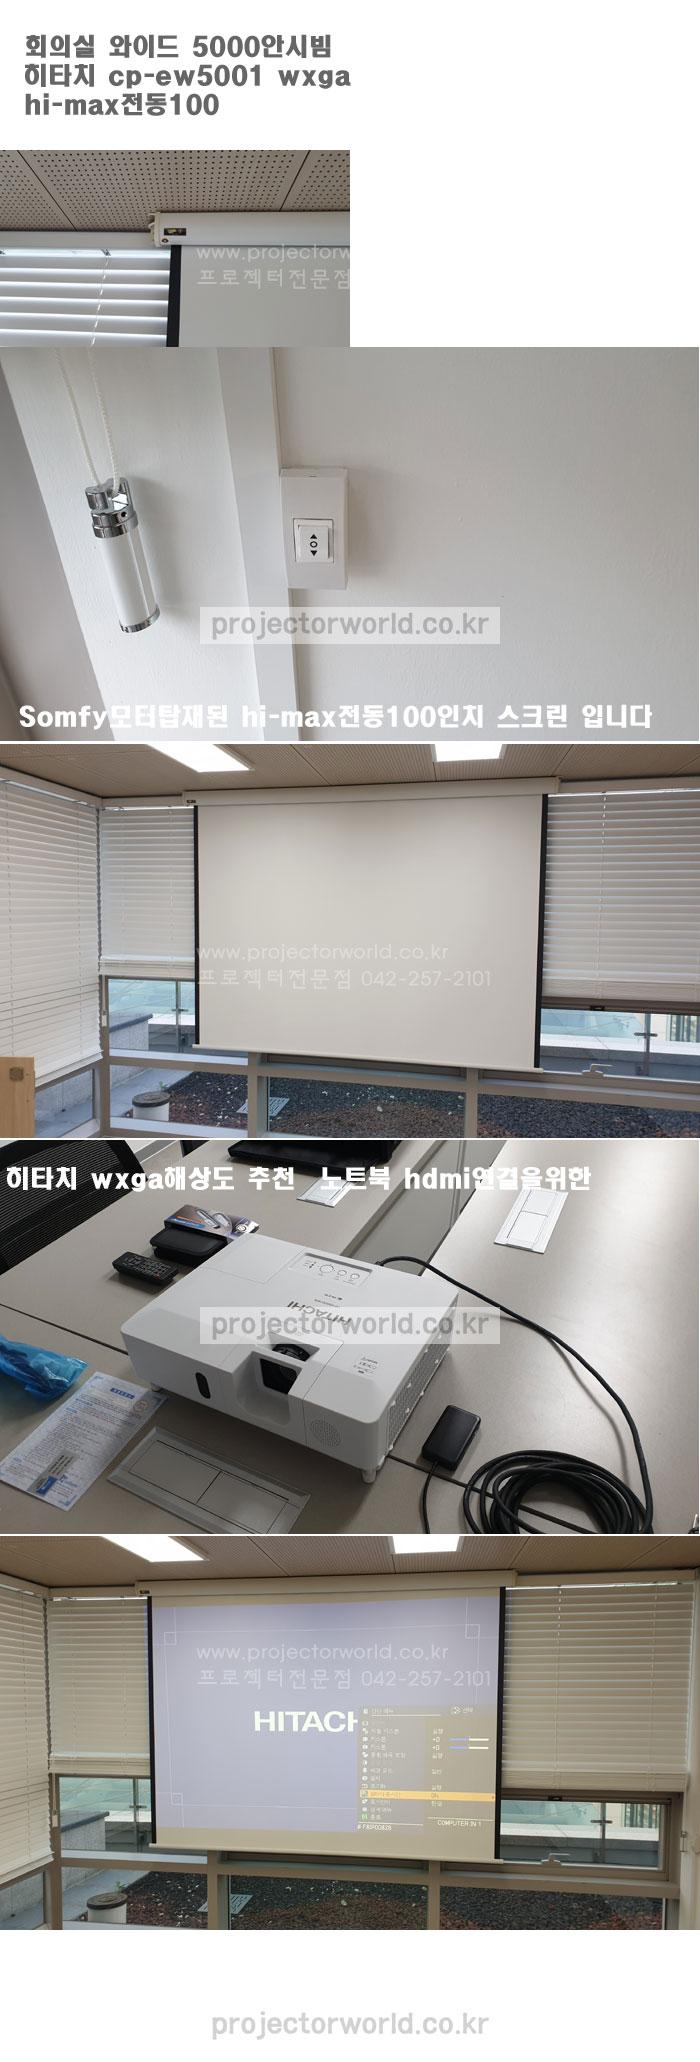 cp-ew5001,somfy,대전스크린,대전프로젝터,와이드해상도빔,빔추천,5000안시밝기,